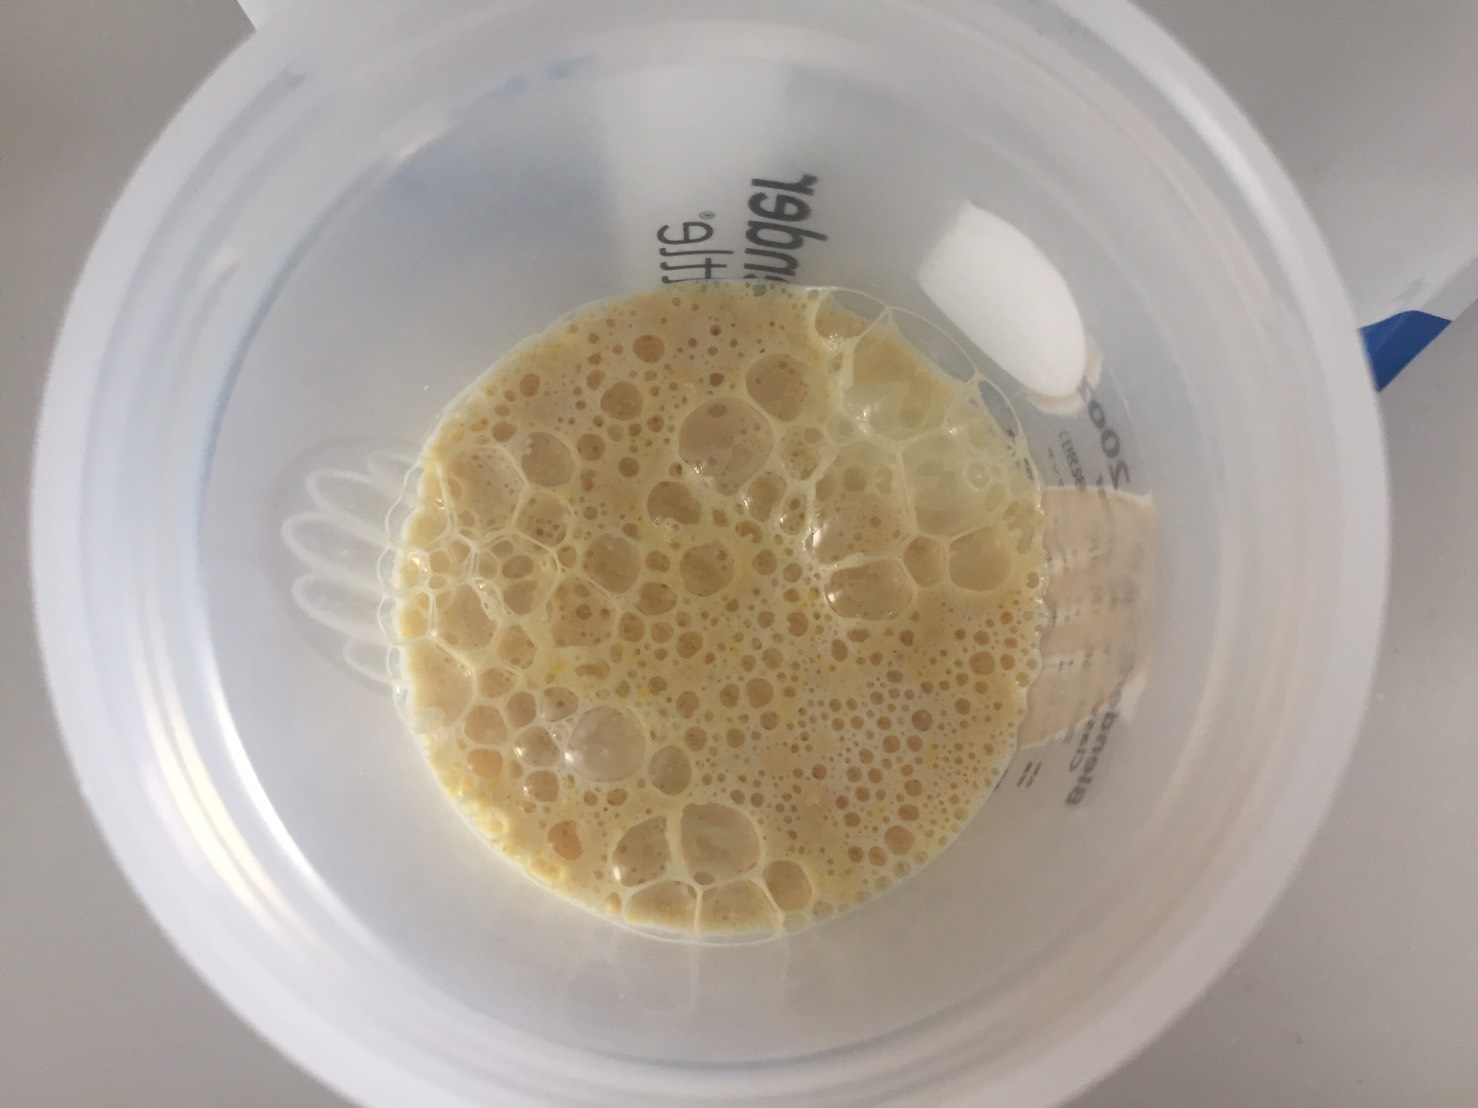 【WPC】Impactホエイプロテイン「Natural Banana(ナチュラルバナナ味)」に牛乳を注いだ直後の様子